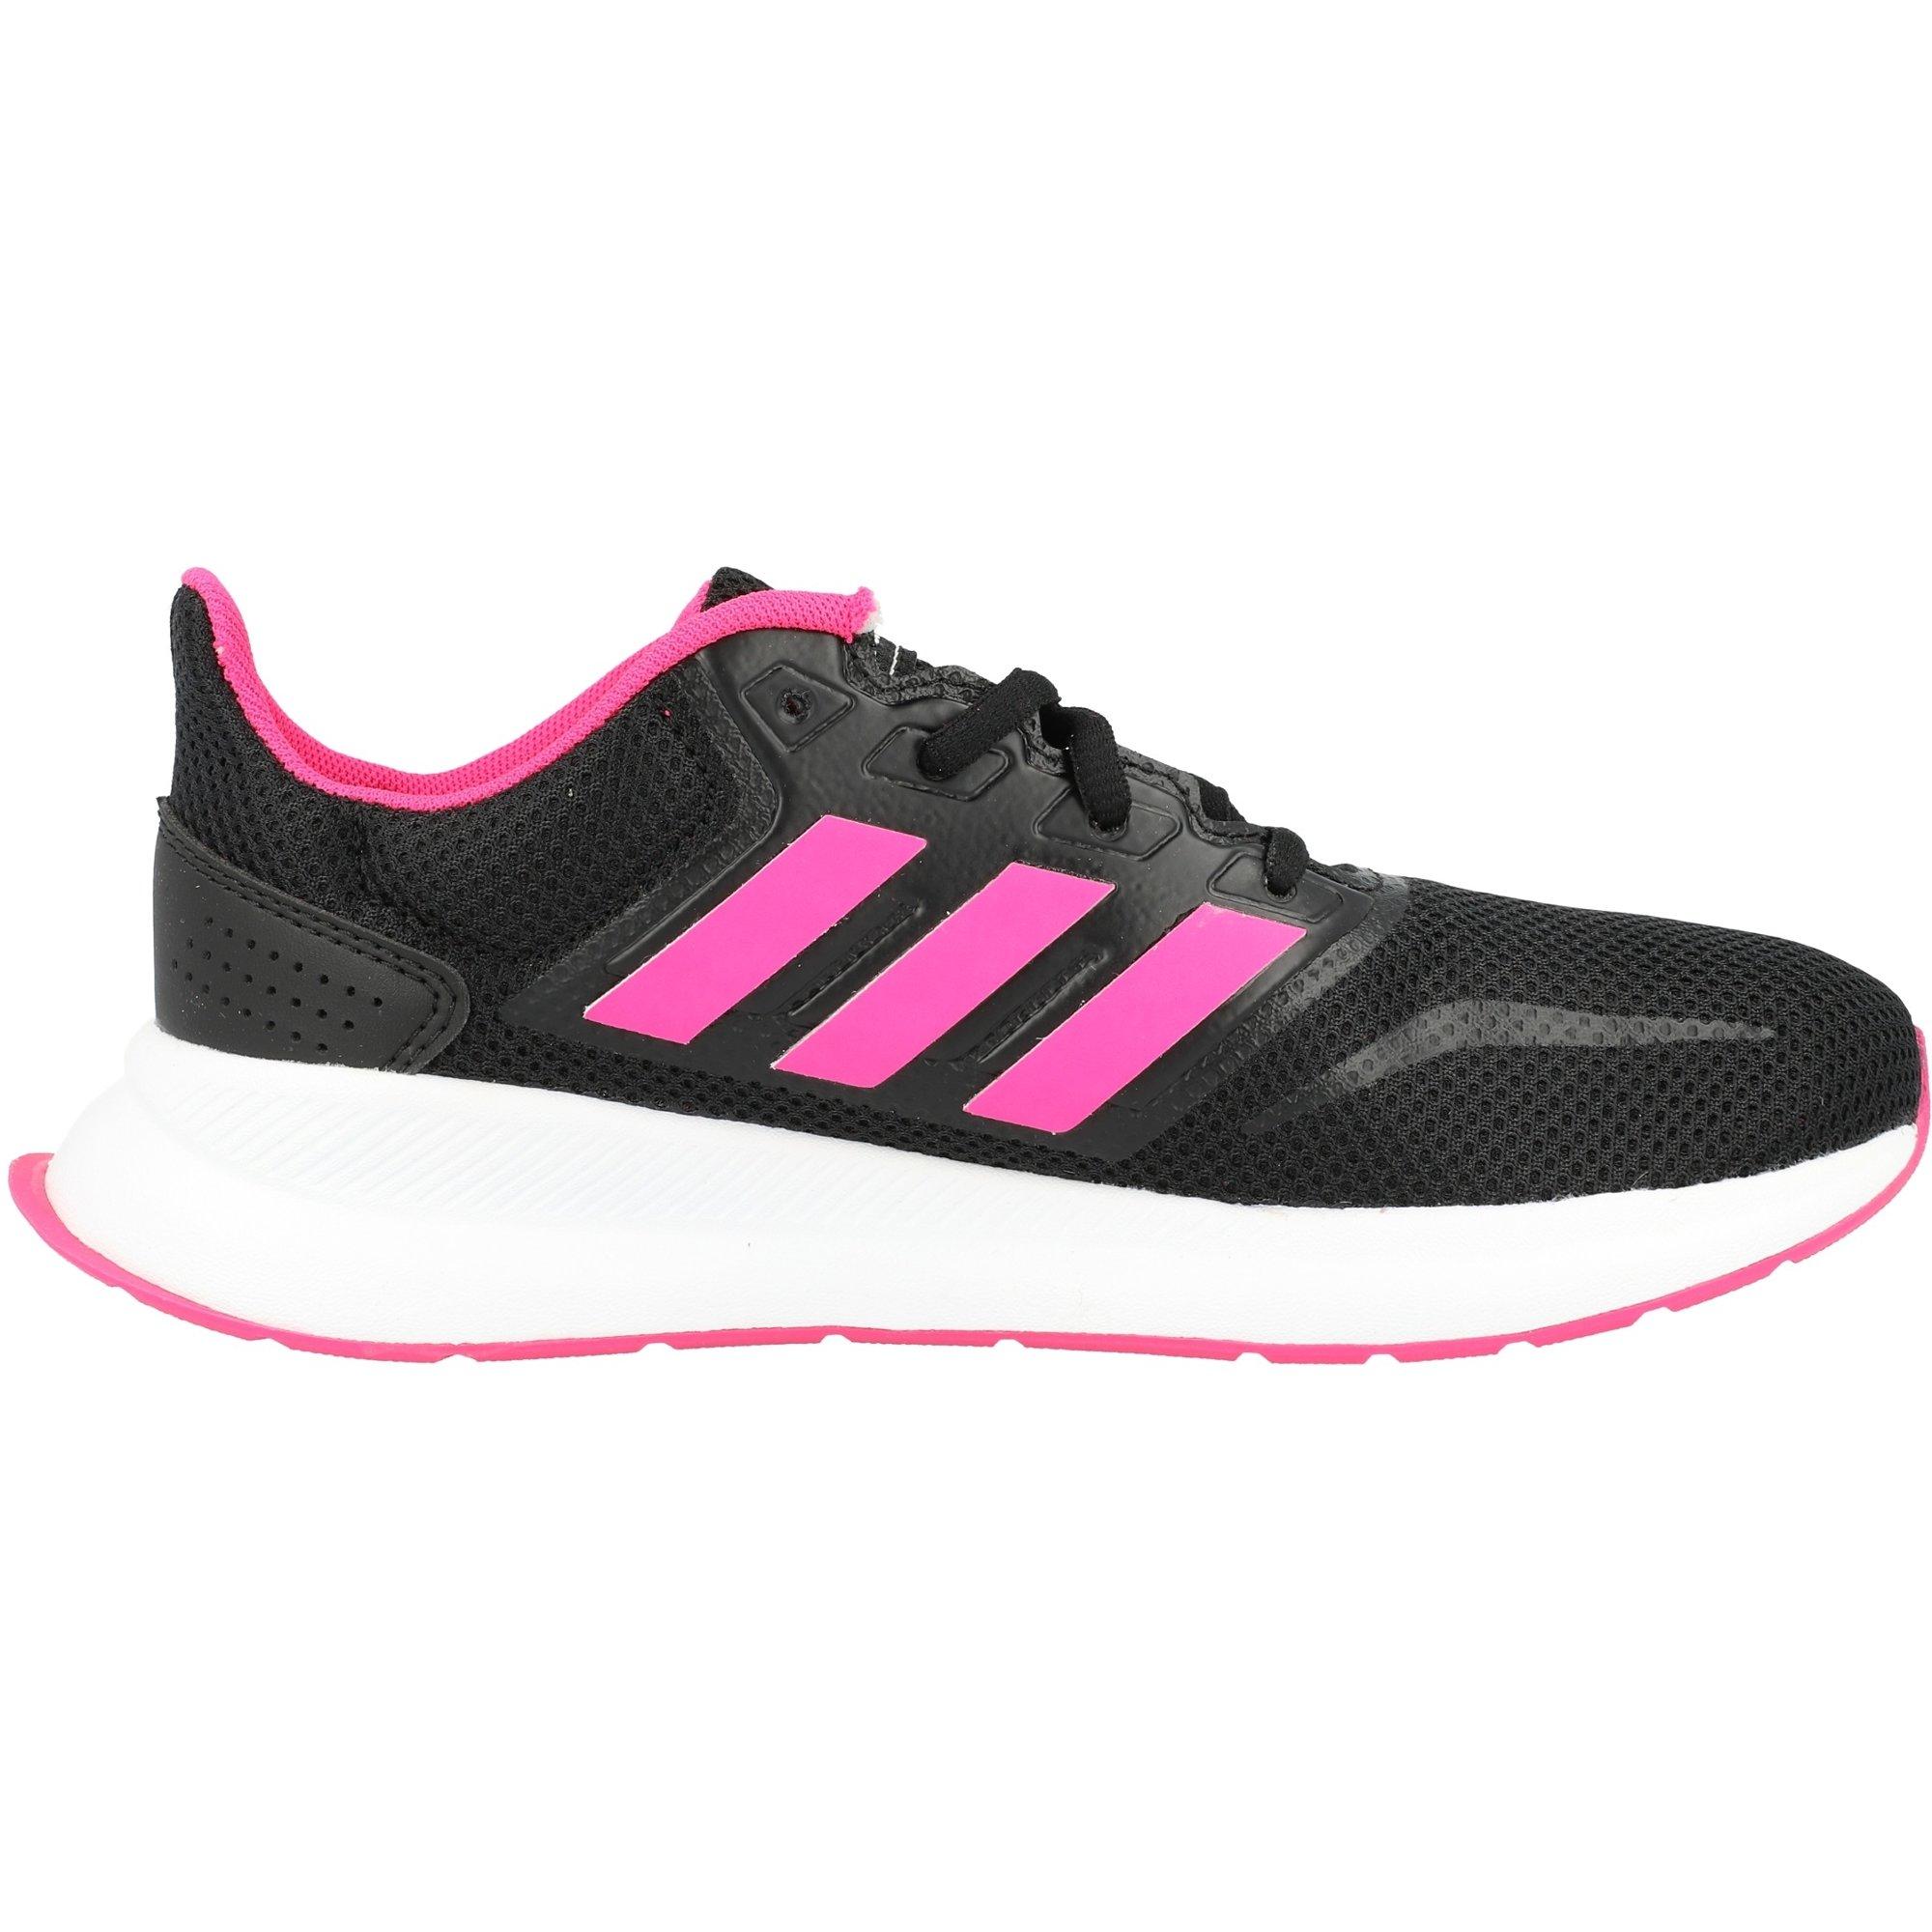 adidas RunFalon K Black/Shock Pink Textile Youth